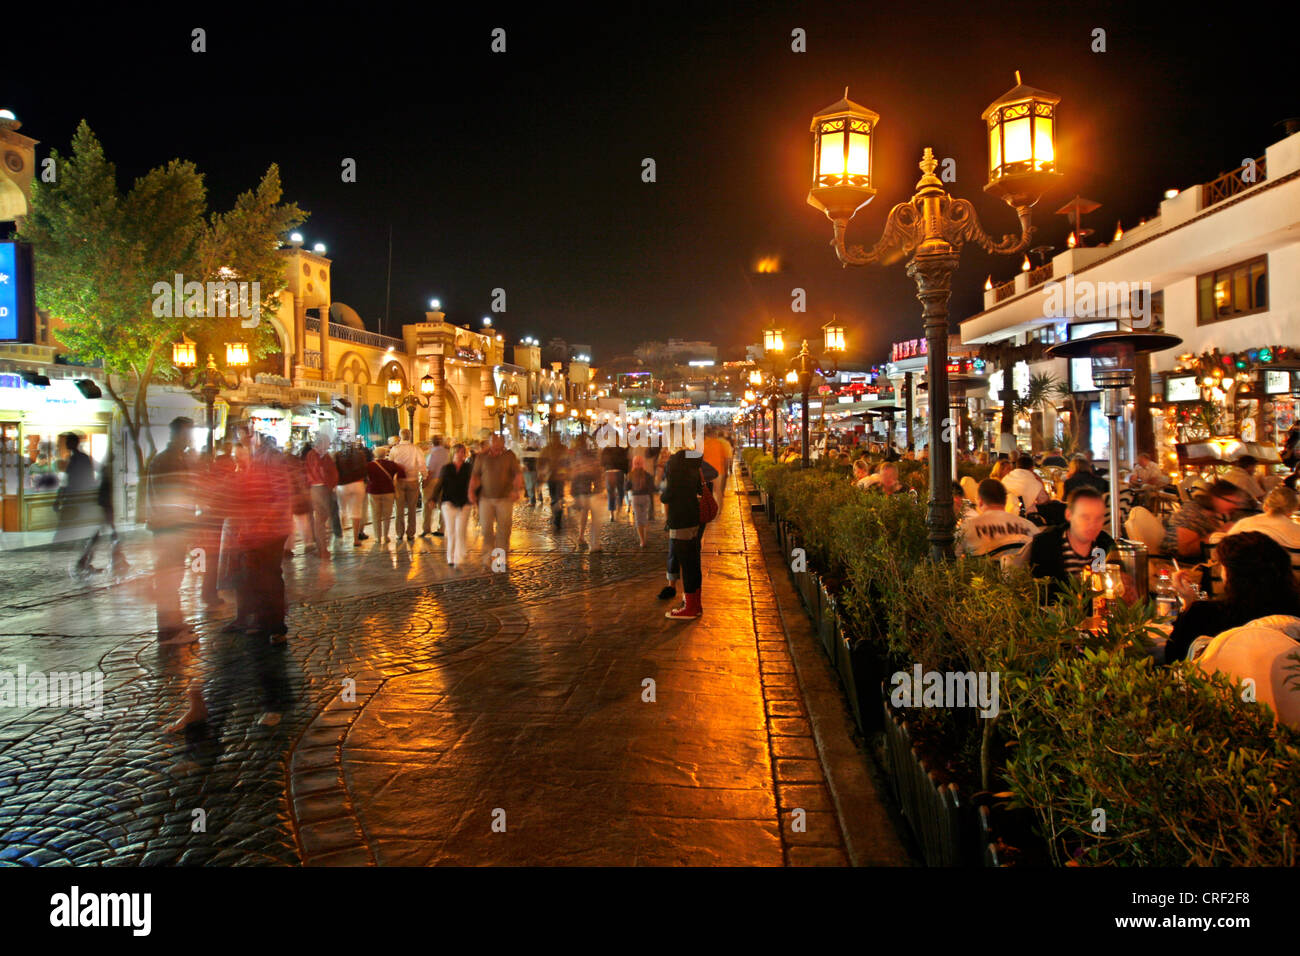 promenade at night, Egypt, Sinai, Sharm El Sheikh - Stock Image